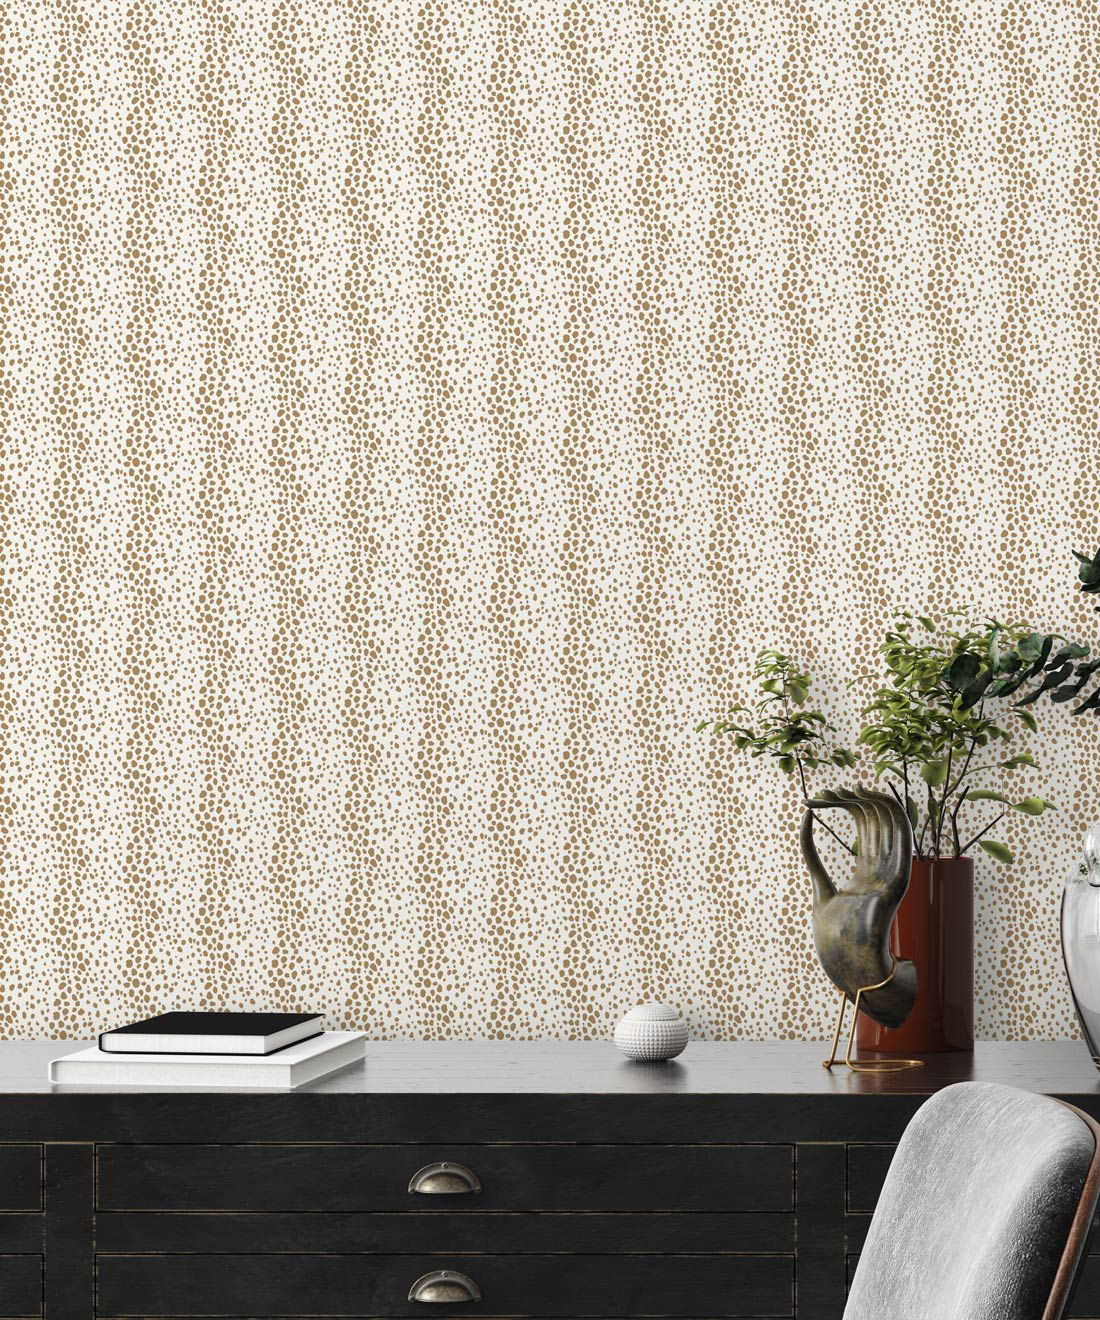 Park Avenue Petite Wallpaper • Dianne Bergeron • Animal Print Wallpaper • Animal Spots Wallpaper • Camel •Insitu